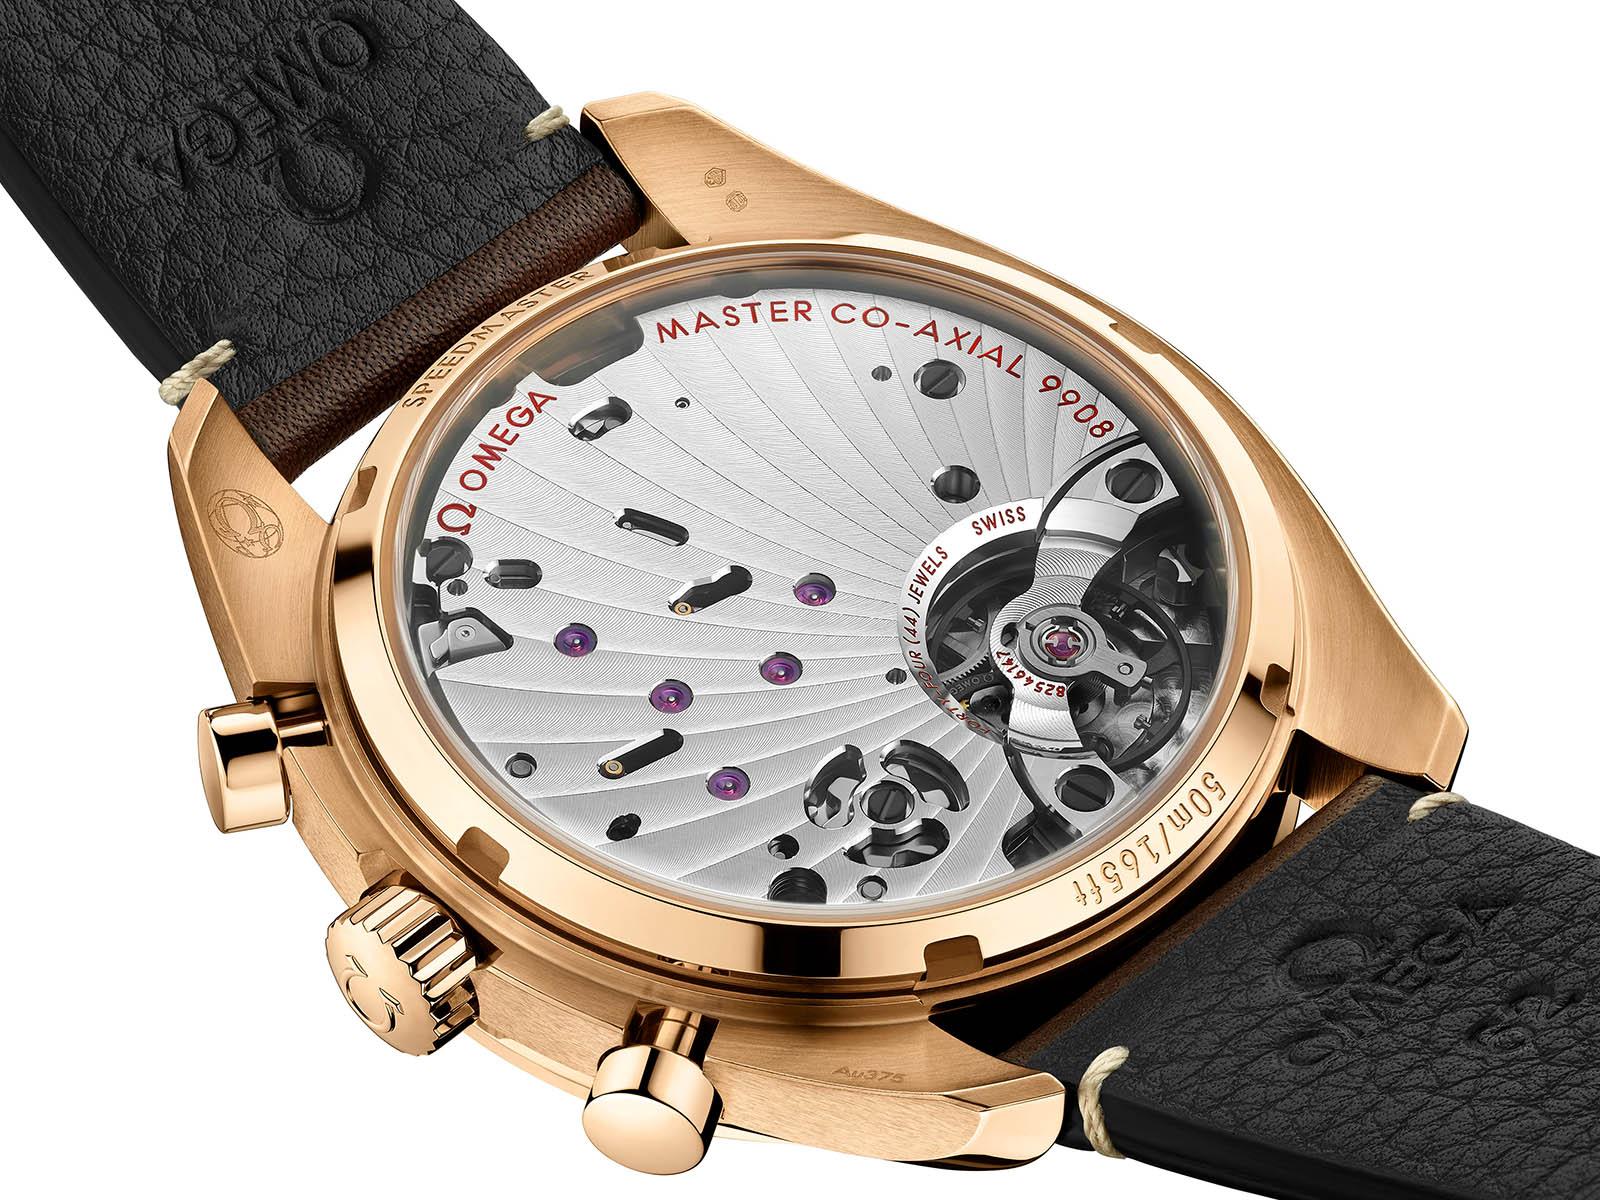 omega-speedmaster-chronoscope-co-axial-master-chronometer-chronograph-8.jpg